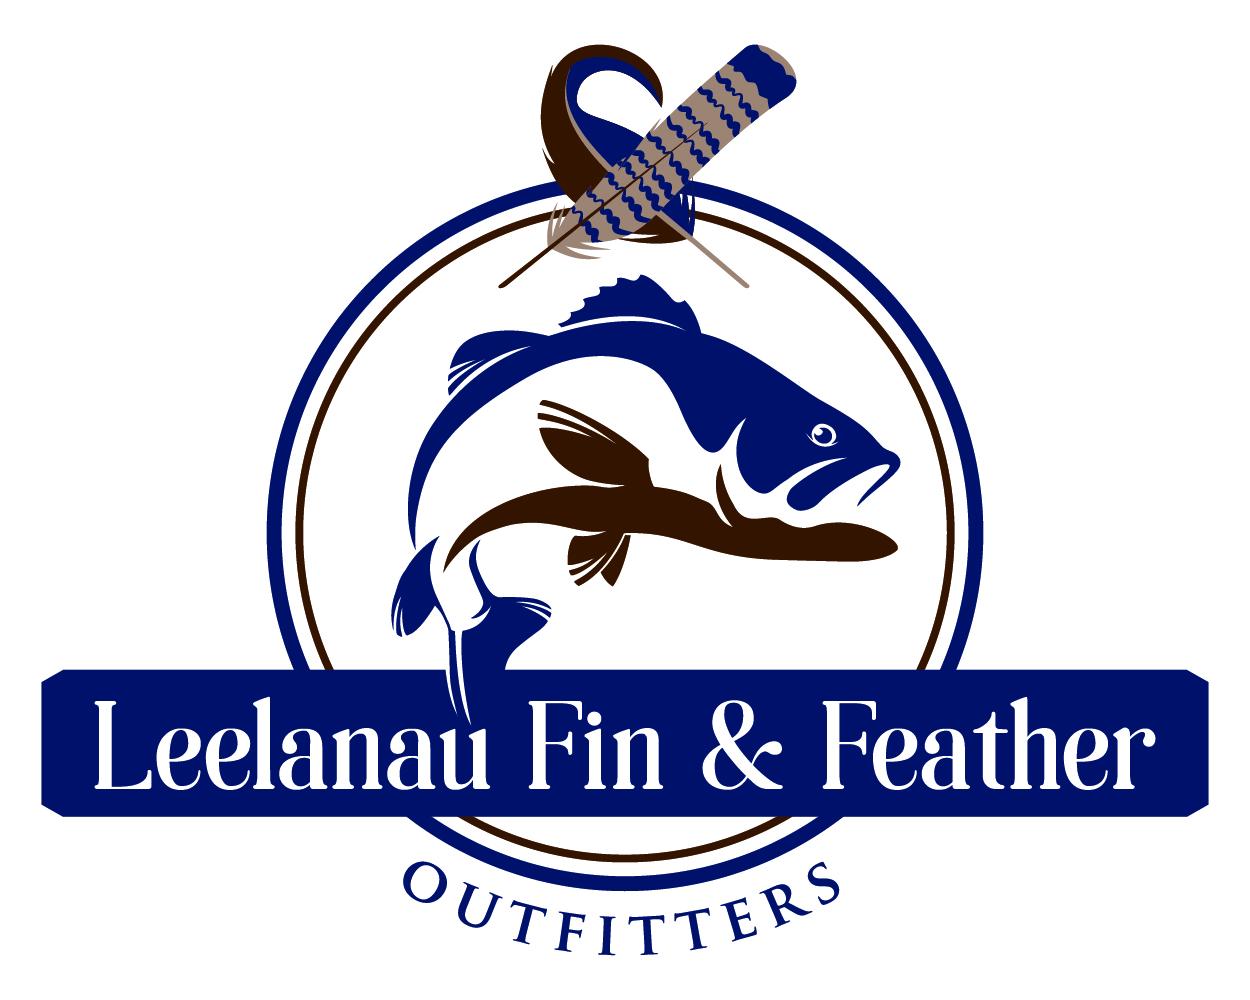 LeelanauFin&Feather CMYK.jpg